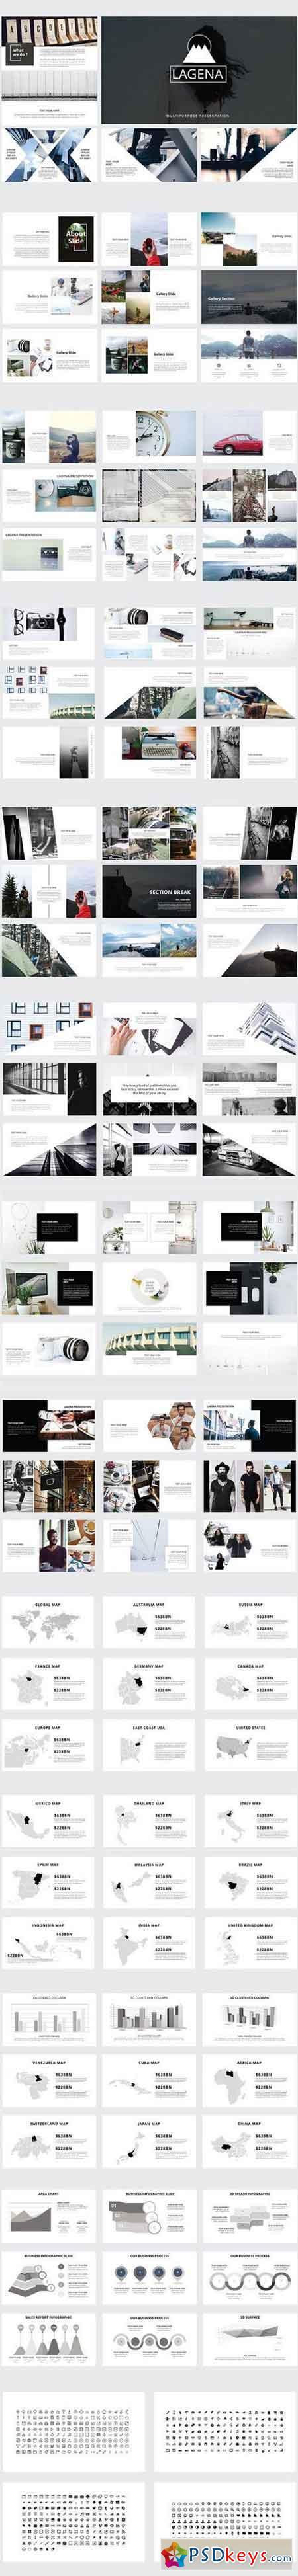 Lagena Presentation Template 1330043